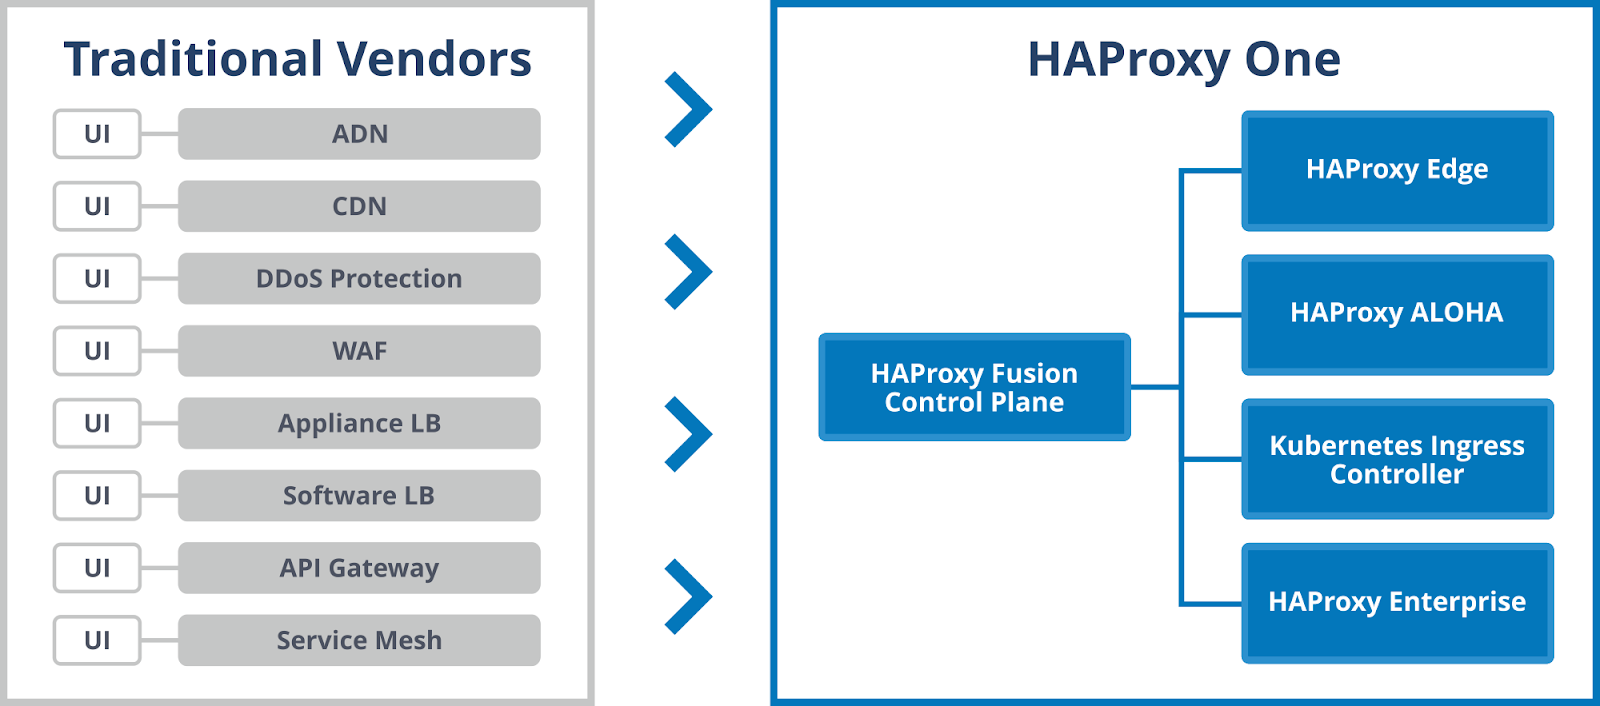 haproxyconf2019_keynote_daniel corbett_11